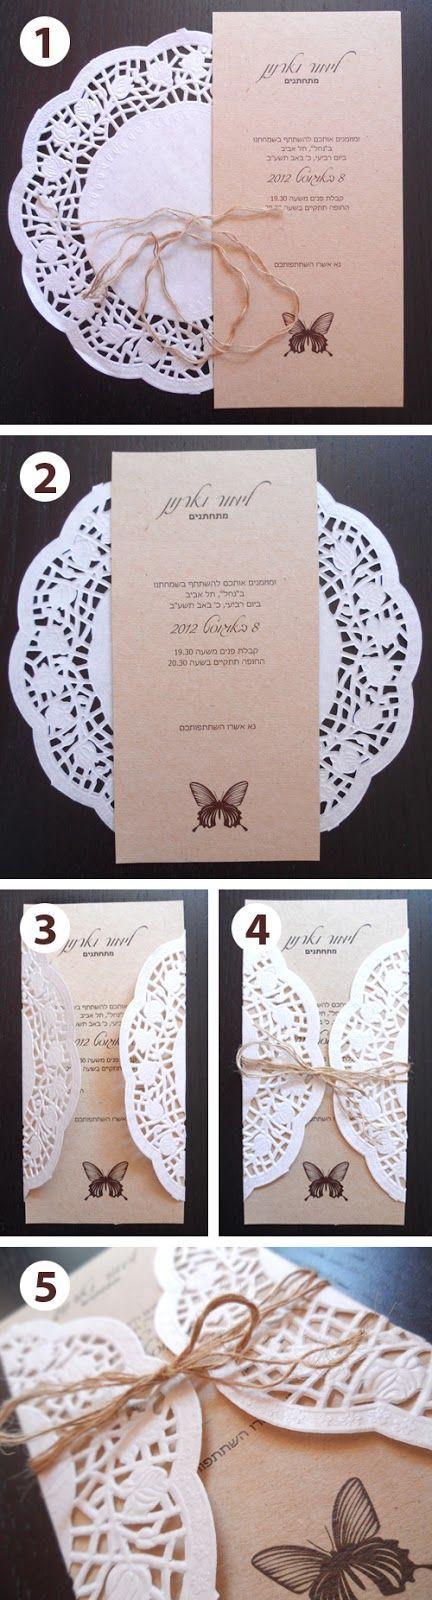 DIY wedding invitation - cheap but beautiful / http://www.himisspuff.com/diy-wedding-invitations/2/